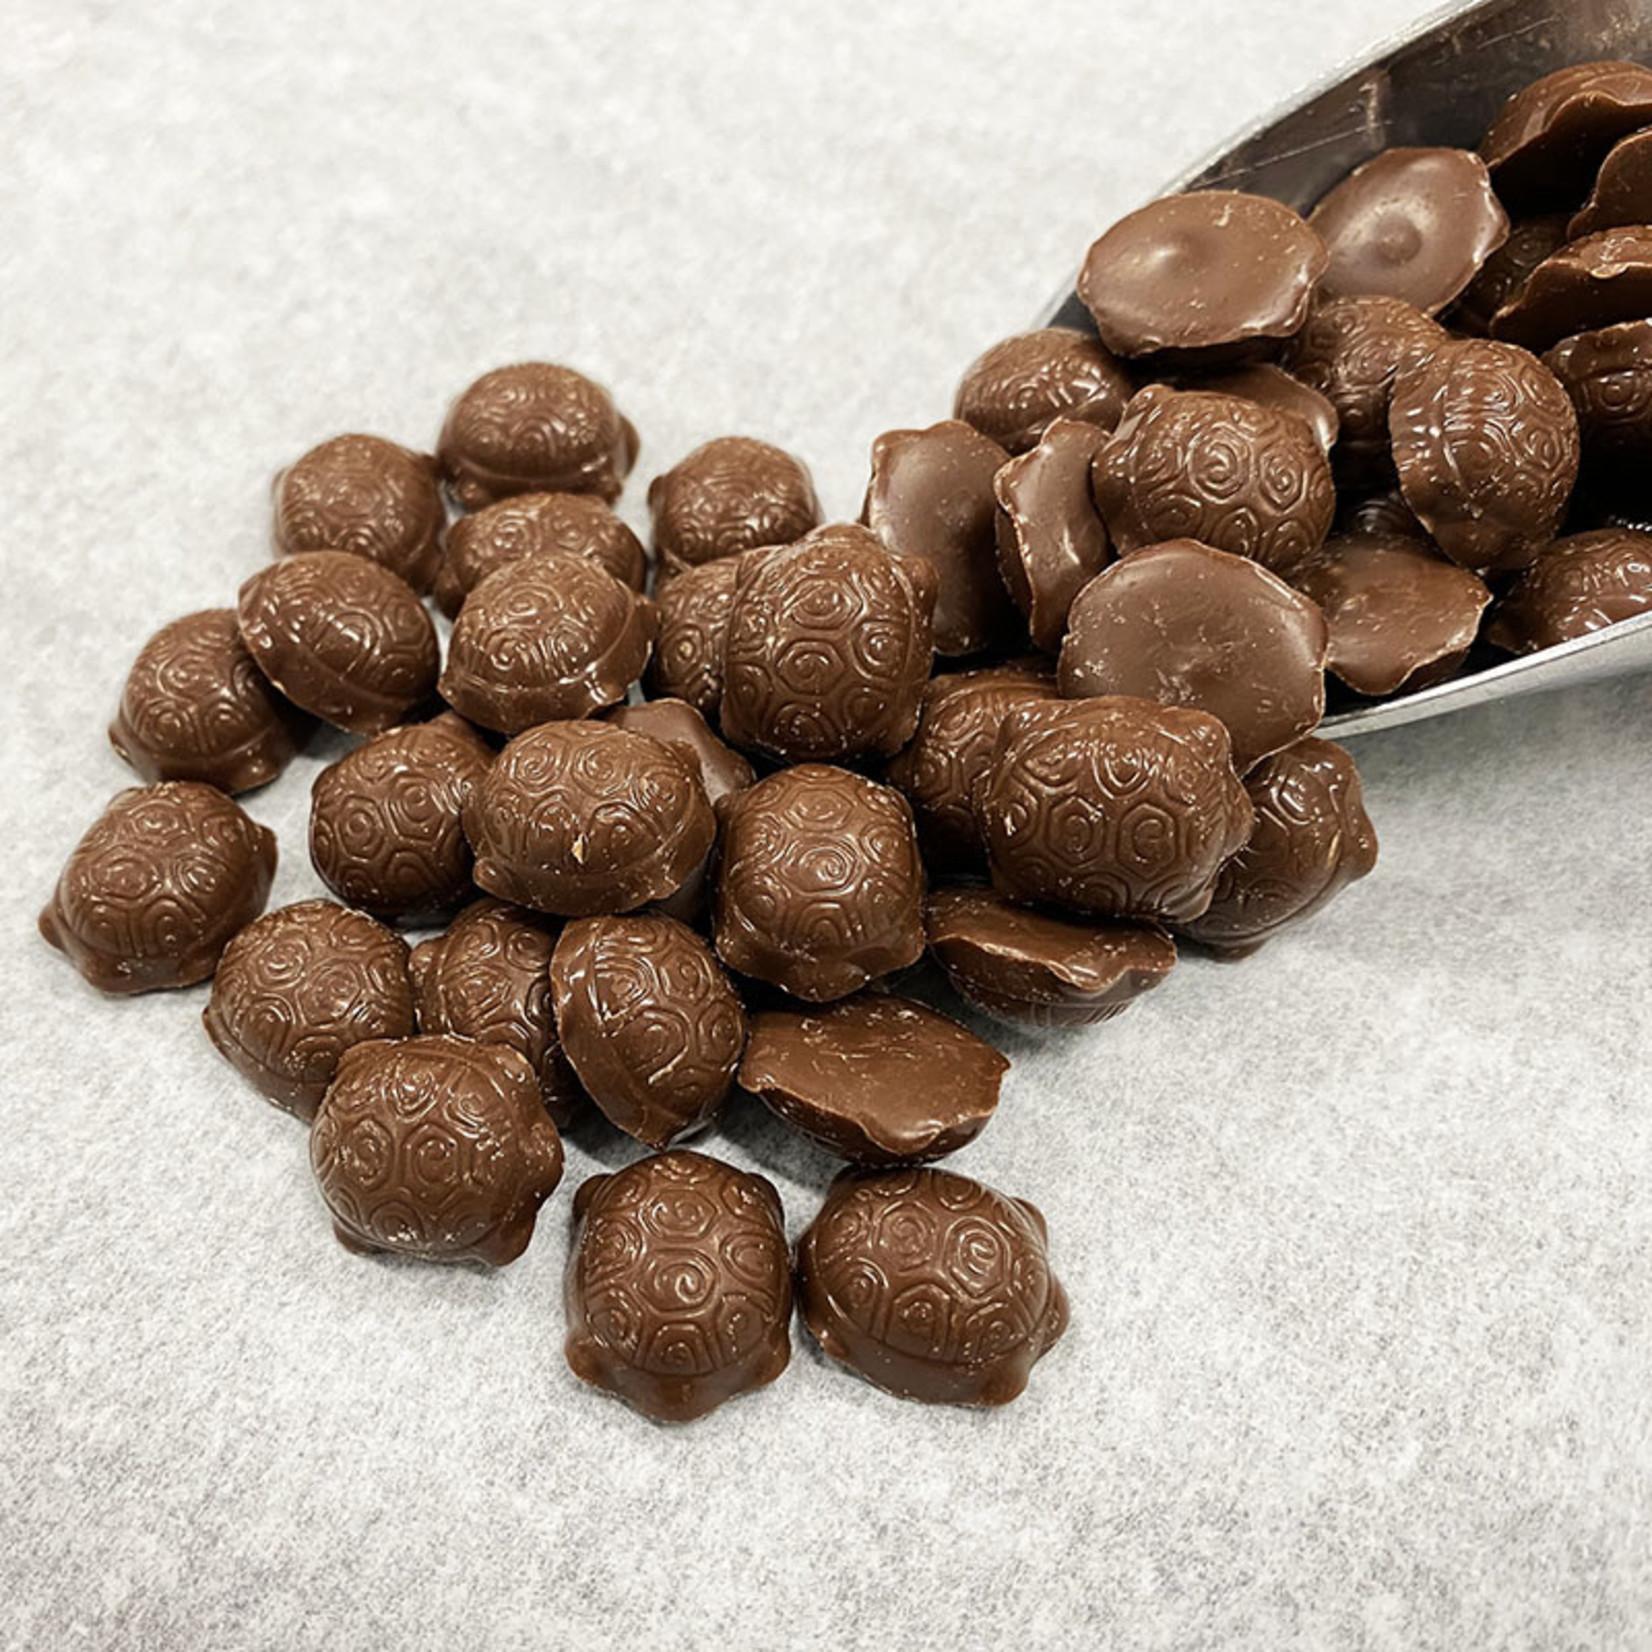 Gertrude Hawk Gertrude Hawk - Milk Chocolate Mini Caramel Turtle, 10lb - IMM-OS-G200551-E14